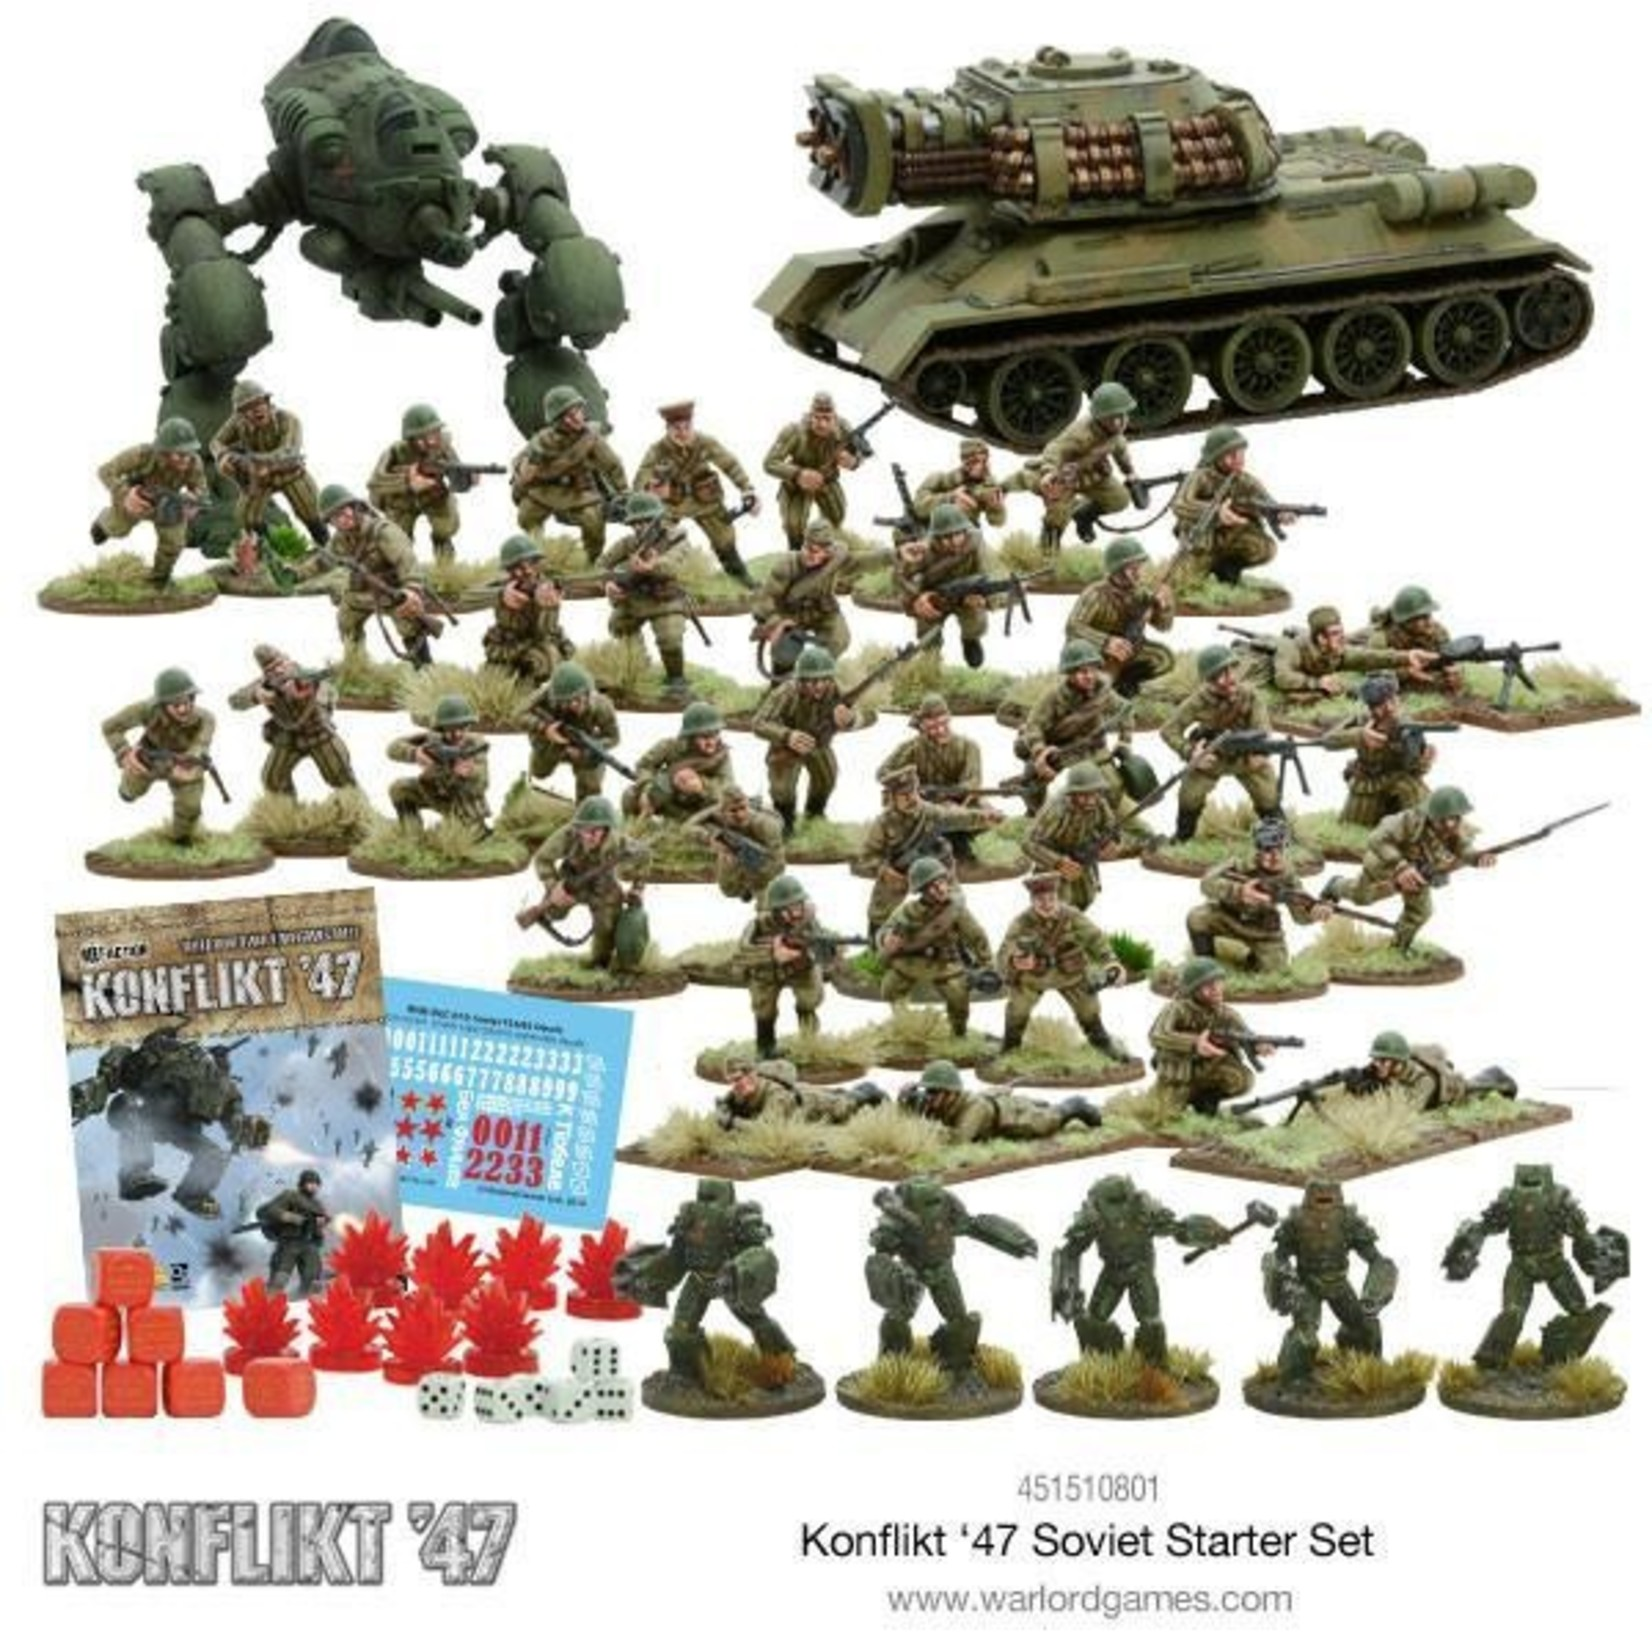 Warlord Games Konflikt 47 Soviet Starter Set